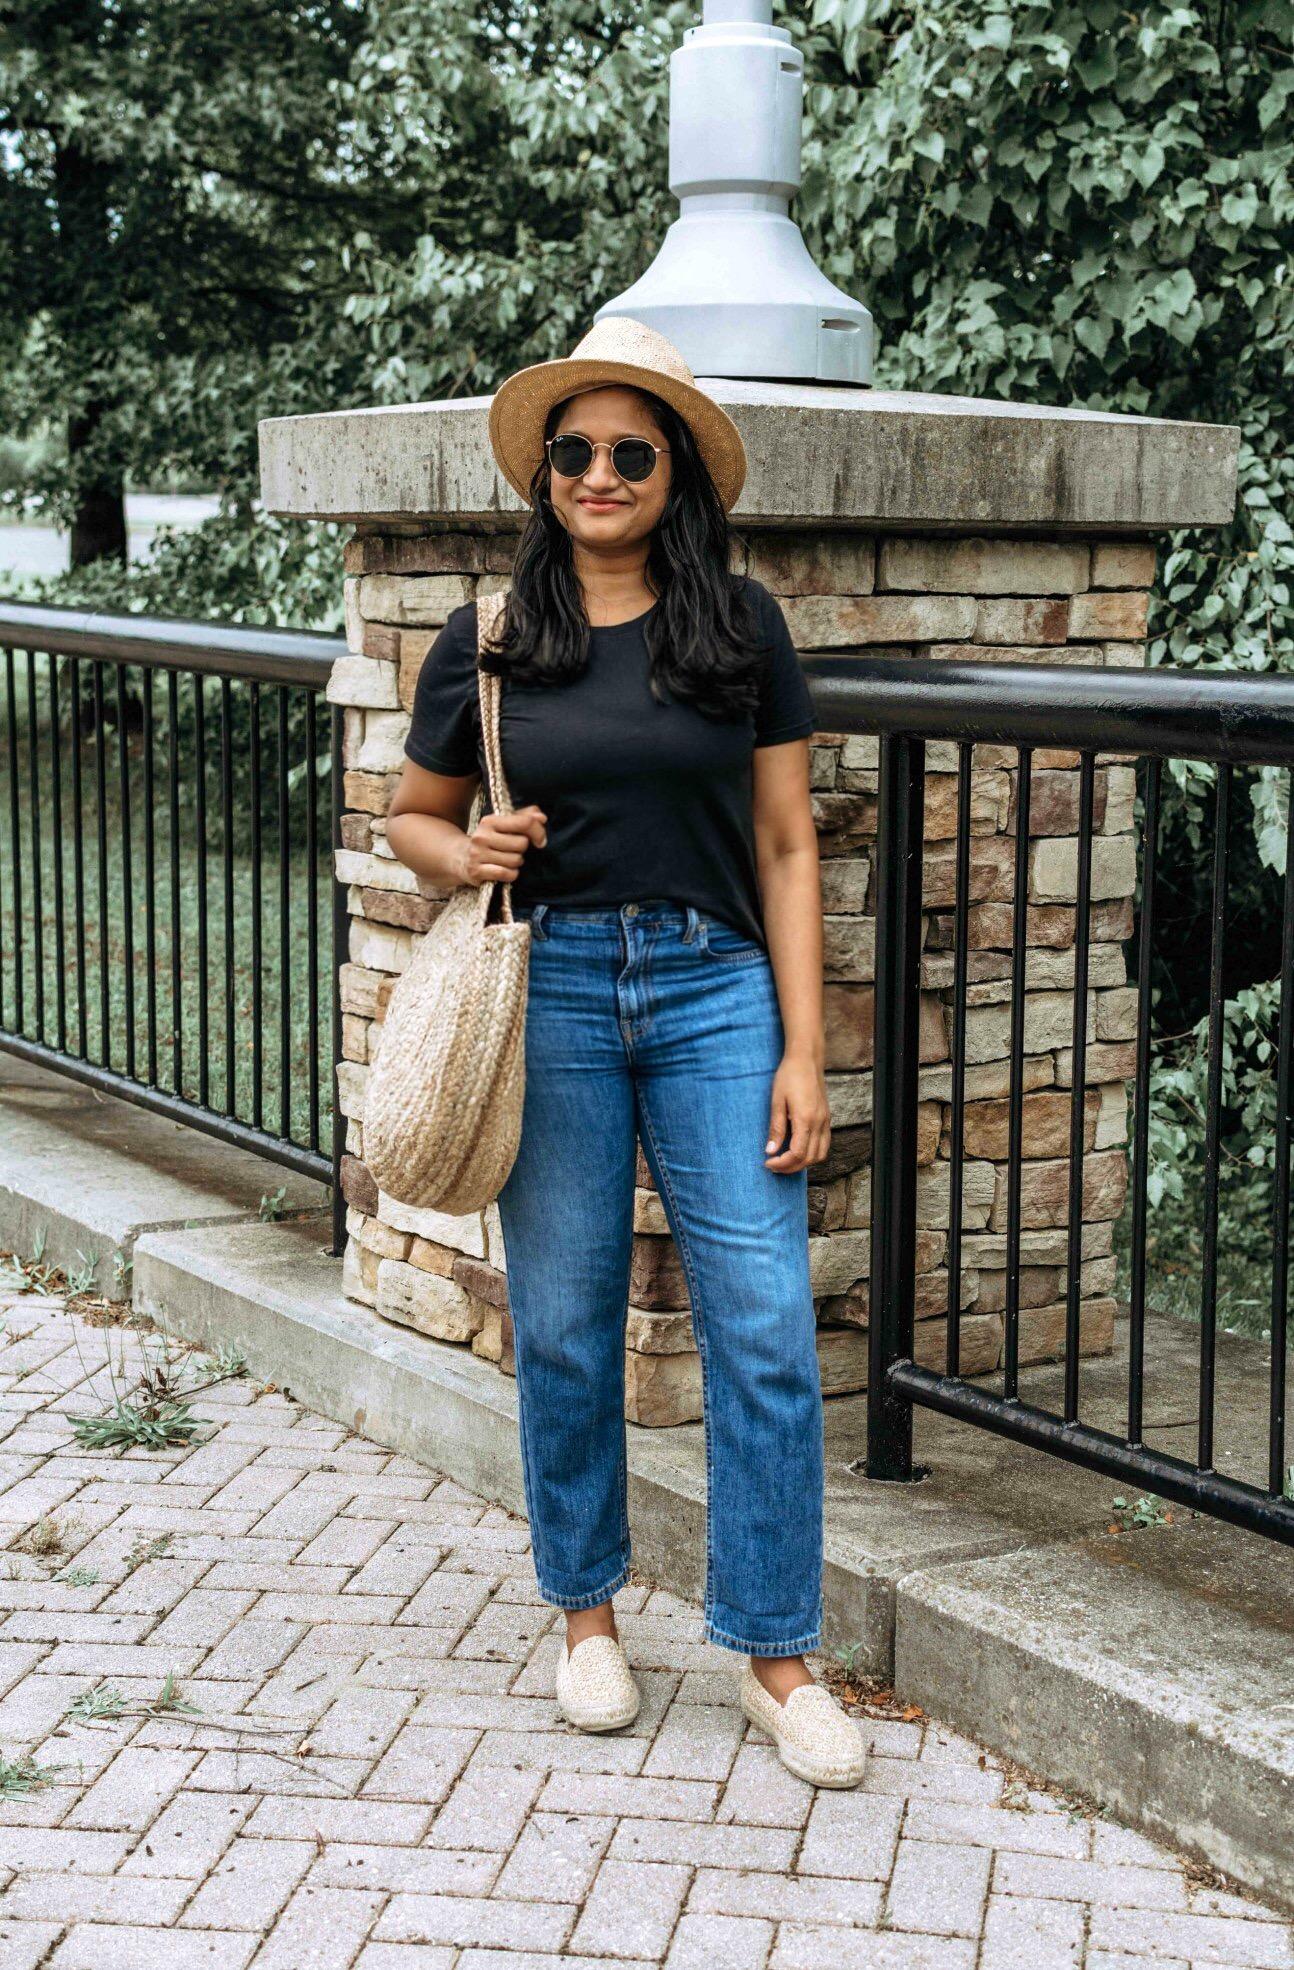 Wearing Everlane summer jeans, Cotton Box-Cut Tee, Manebí Yucatan Raffia Espadrilles, Straw circle bag and straw hat 1